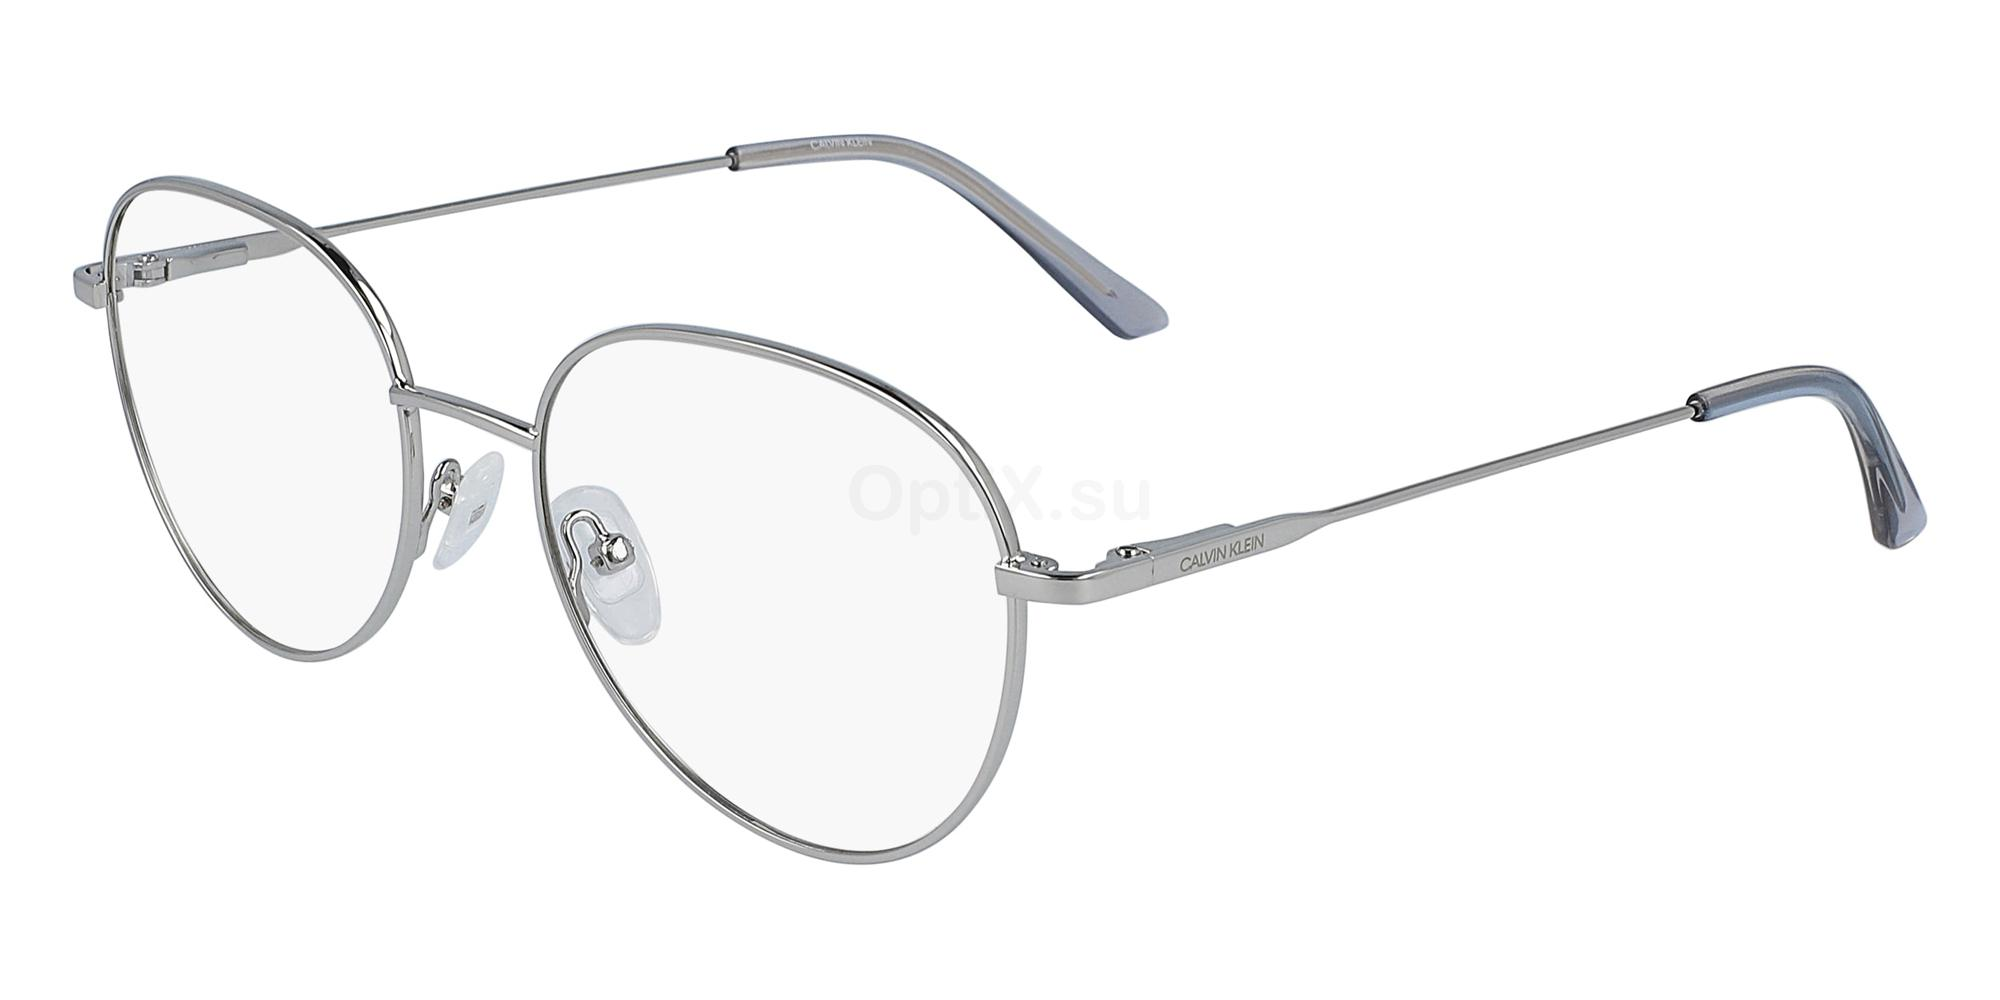 045 CK19130 Glasses, Calvin Klein